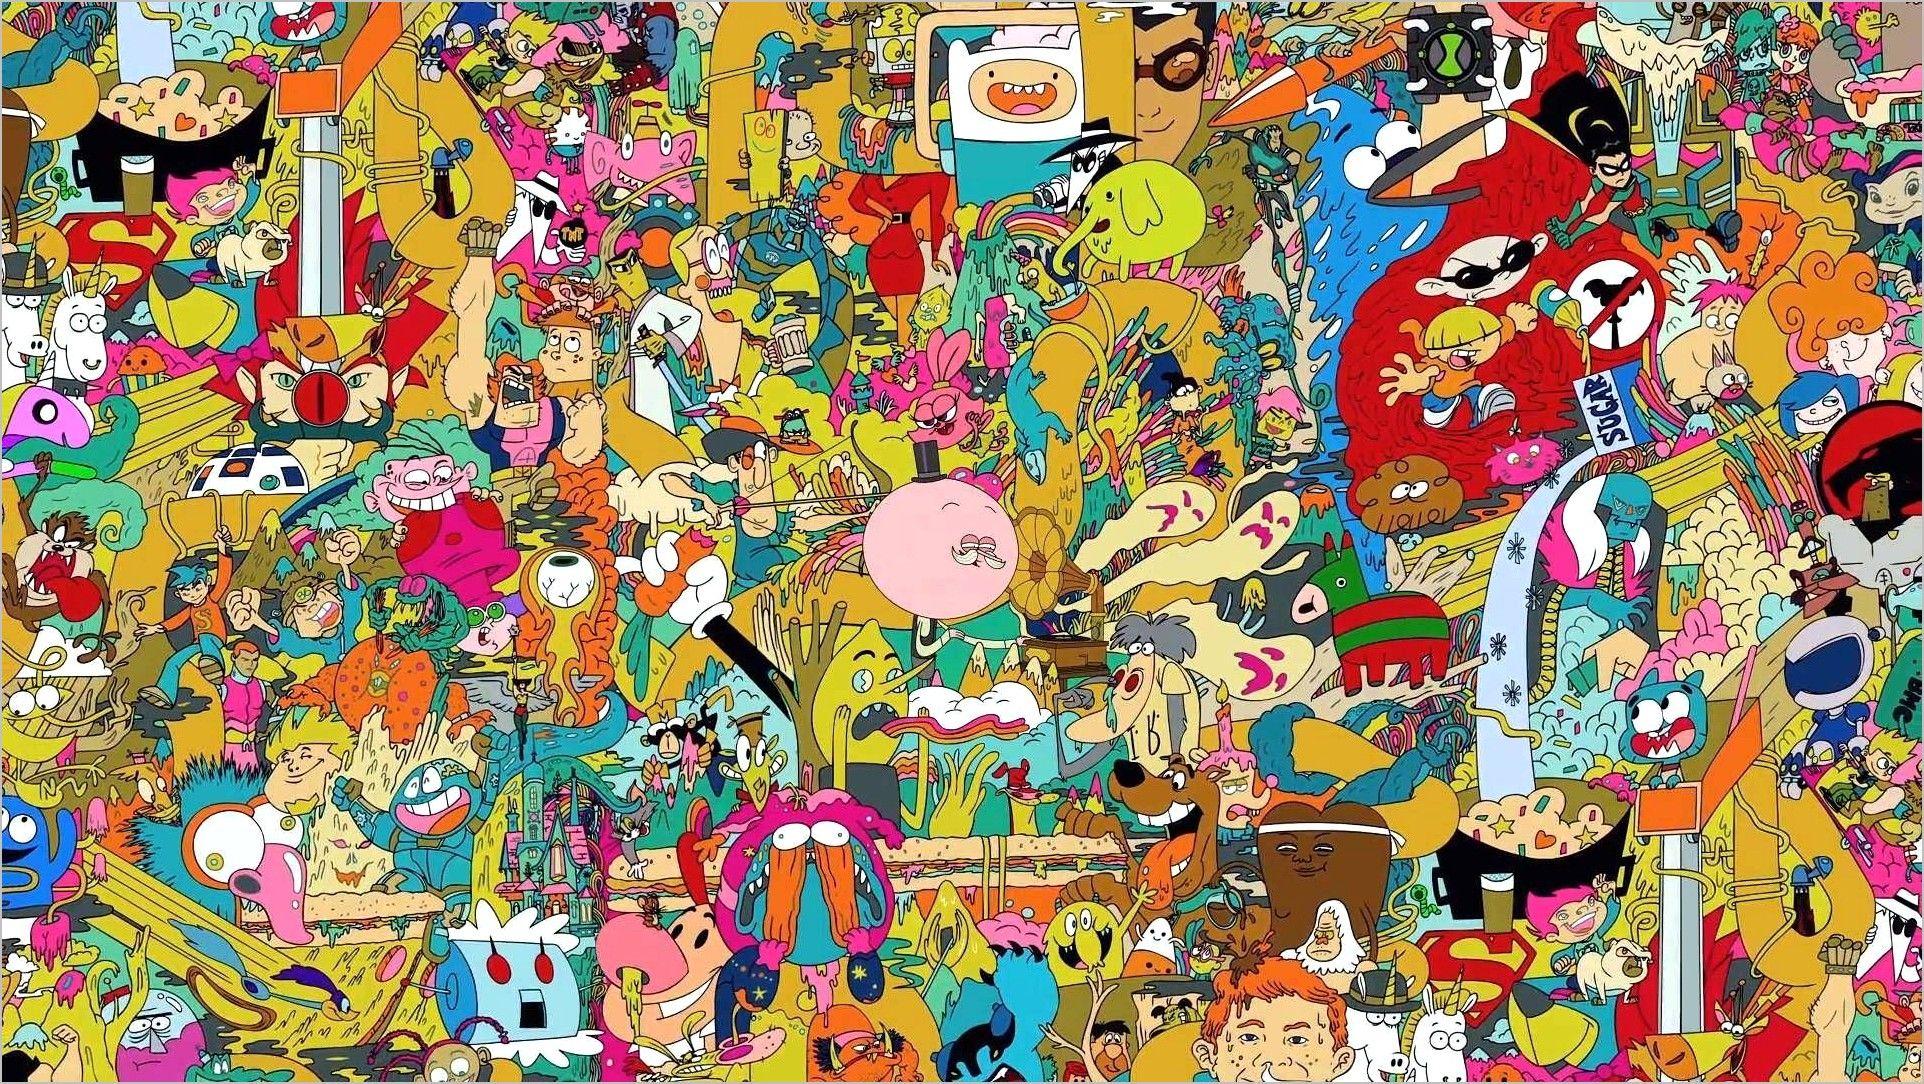 Takashi Murakami Wallpaper 4k Cartoon Wallpaper Cartoon Wallpaper Hd Incredible Cartoon